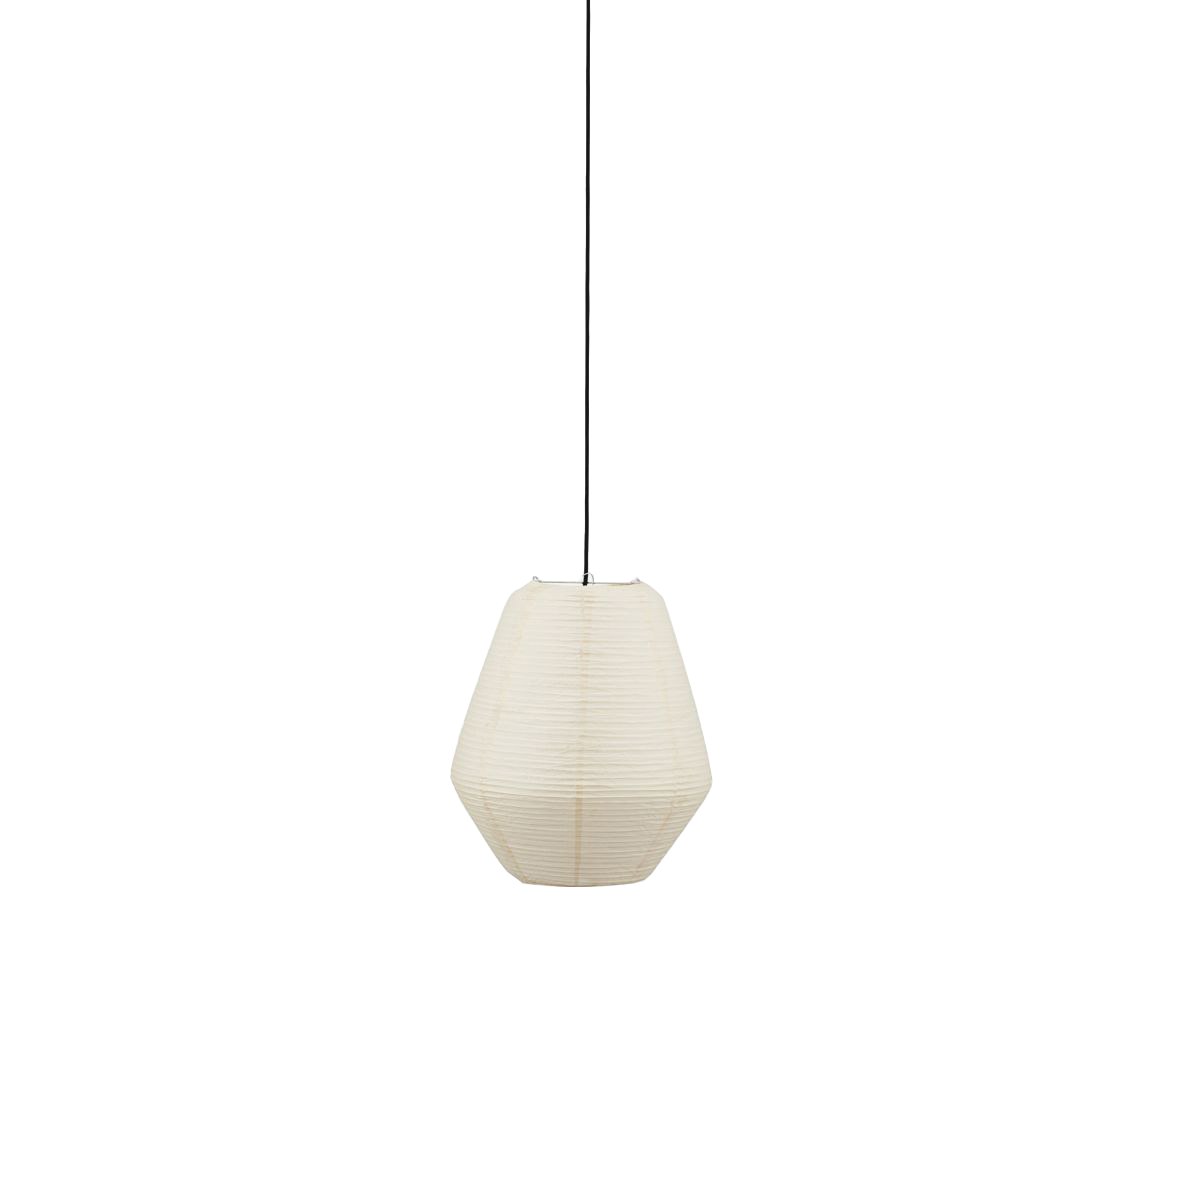 House Doctor - Bidar Lamp Shade Ø 36 cm - Sand (259370122)